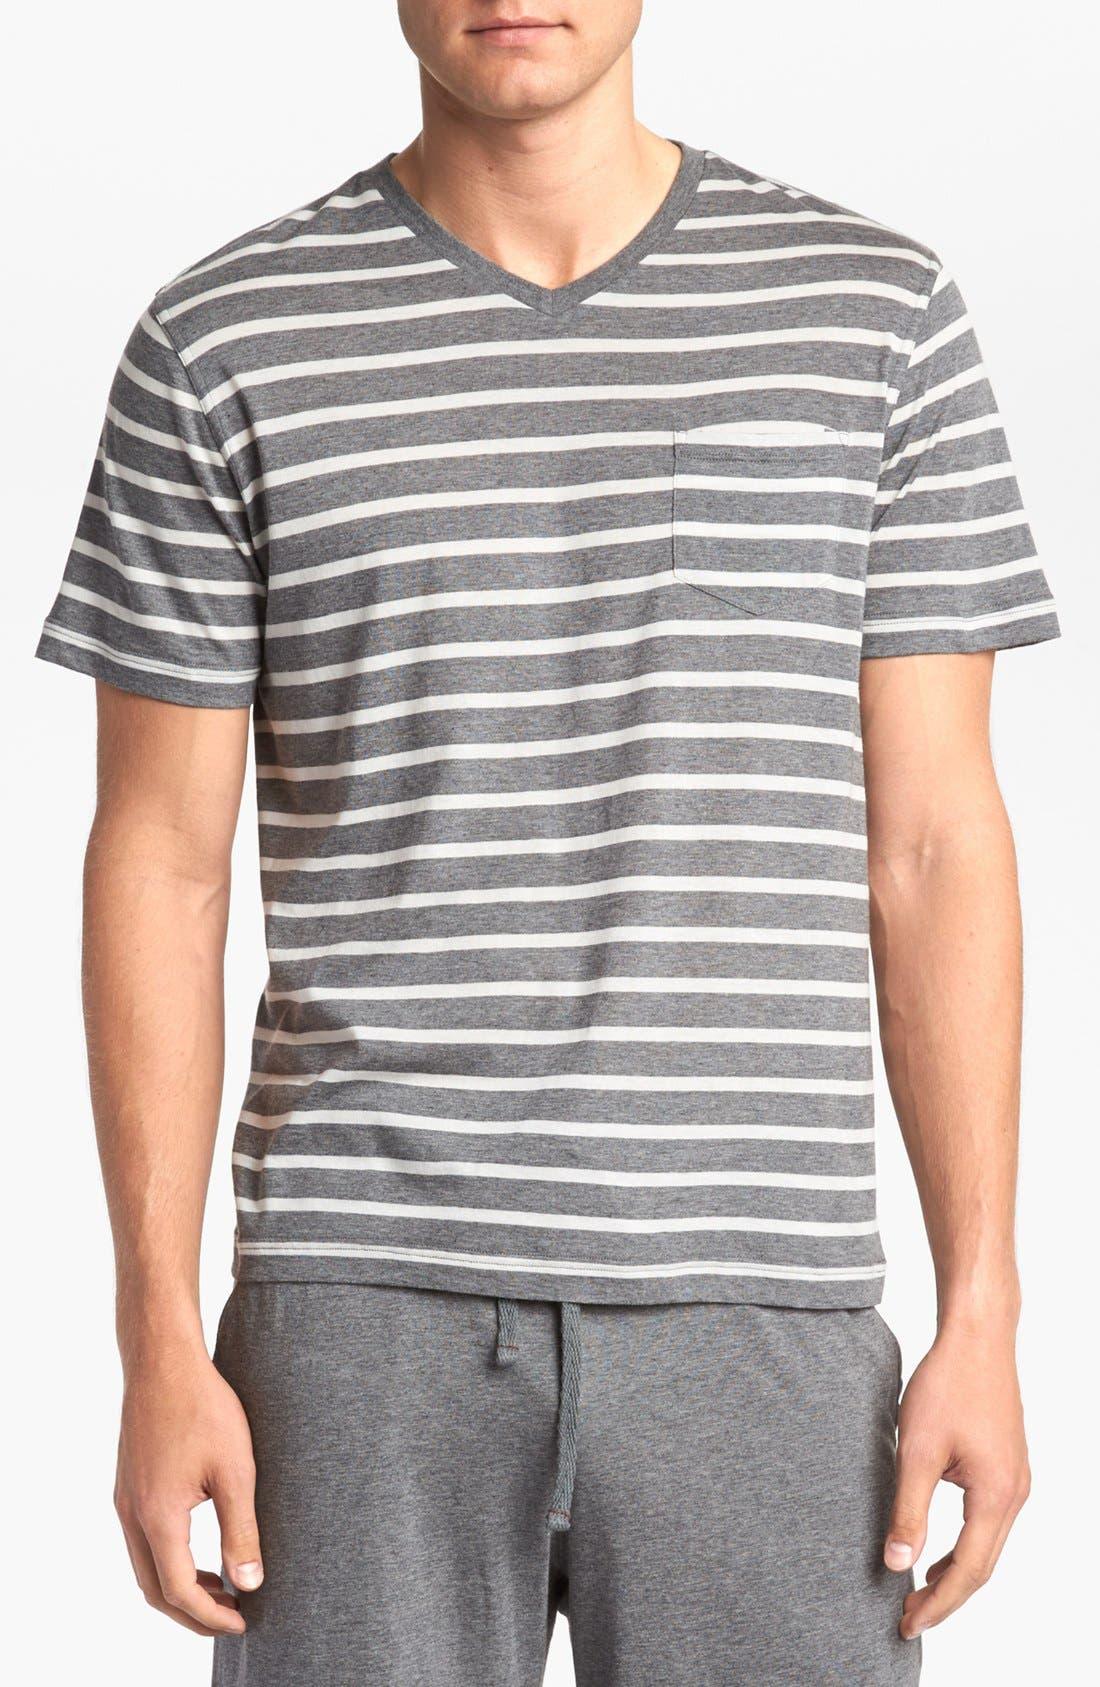 Alternate Image 1 Selected - Daniel Buchler Cotton/Modal Blend T-Shirt